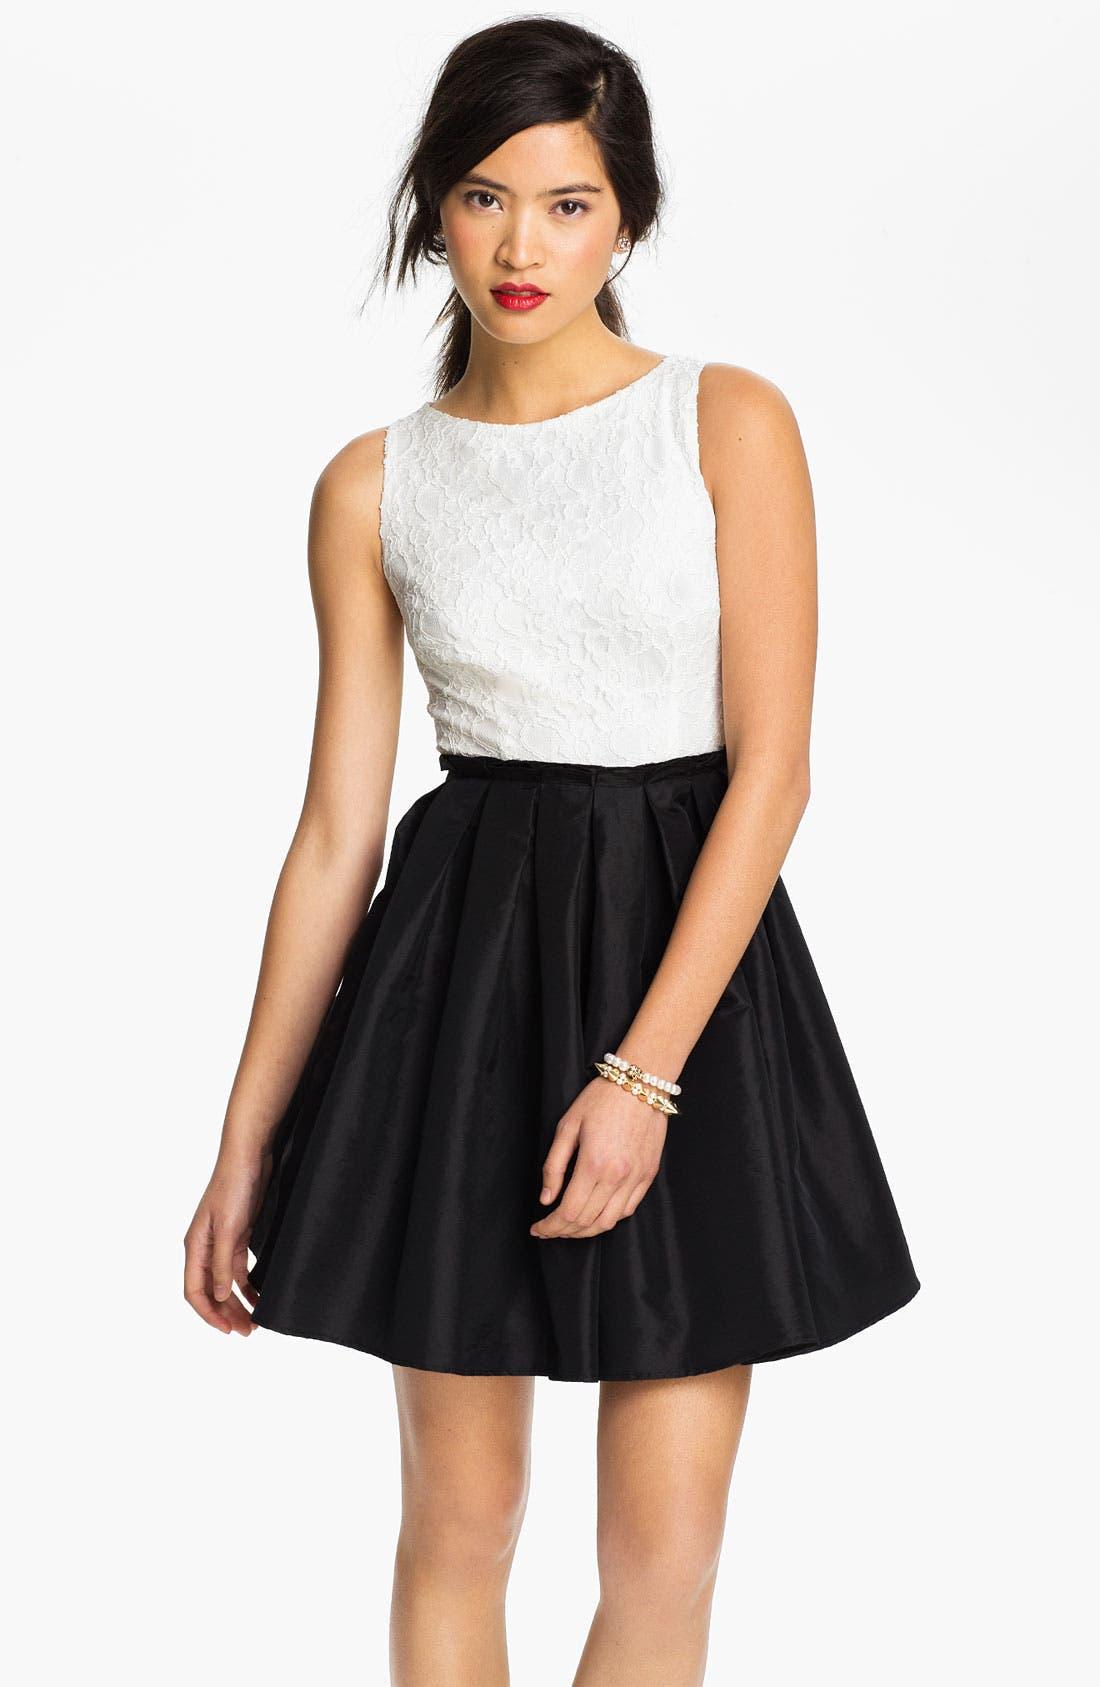 Alternate Image 1 Selected - Way-In Lace & Taffeta Dress (Juniors)